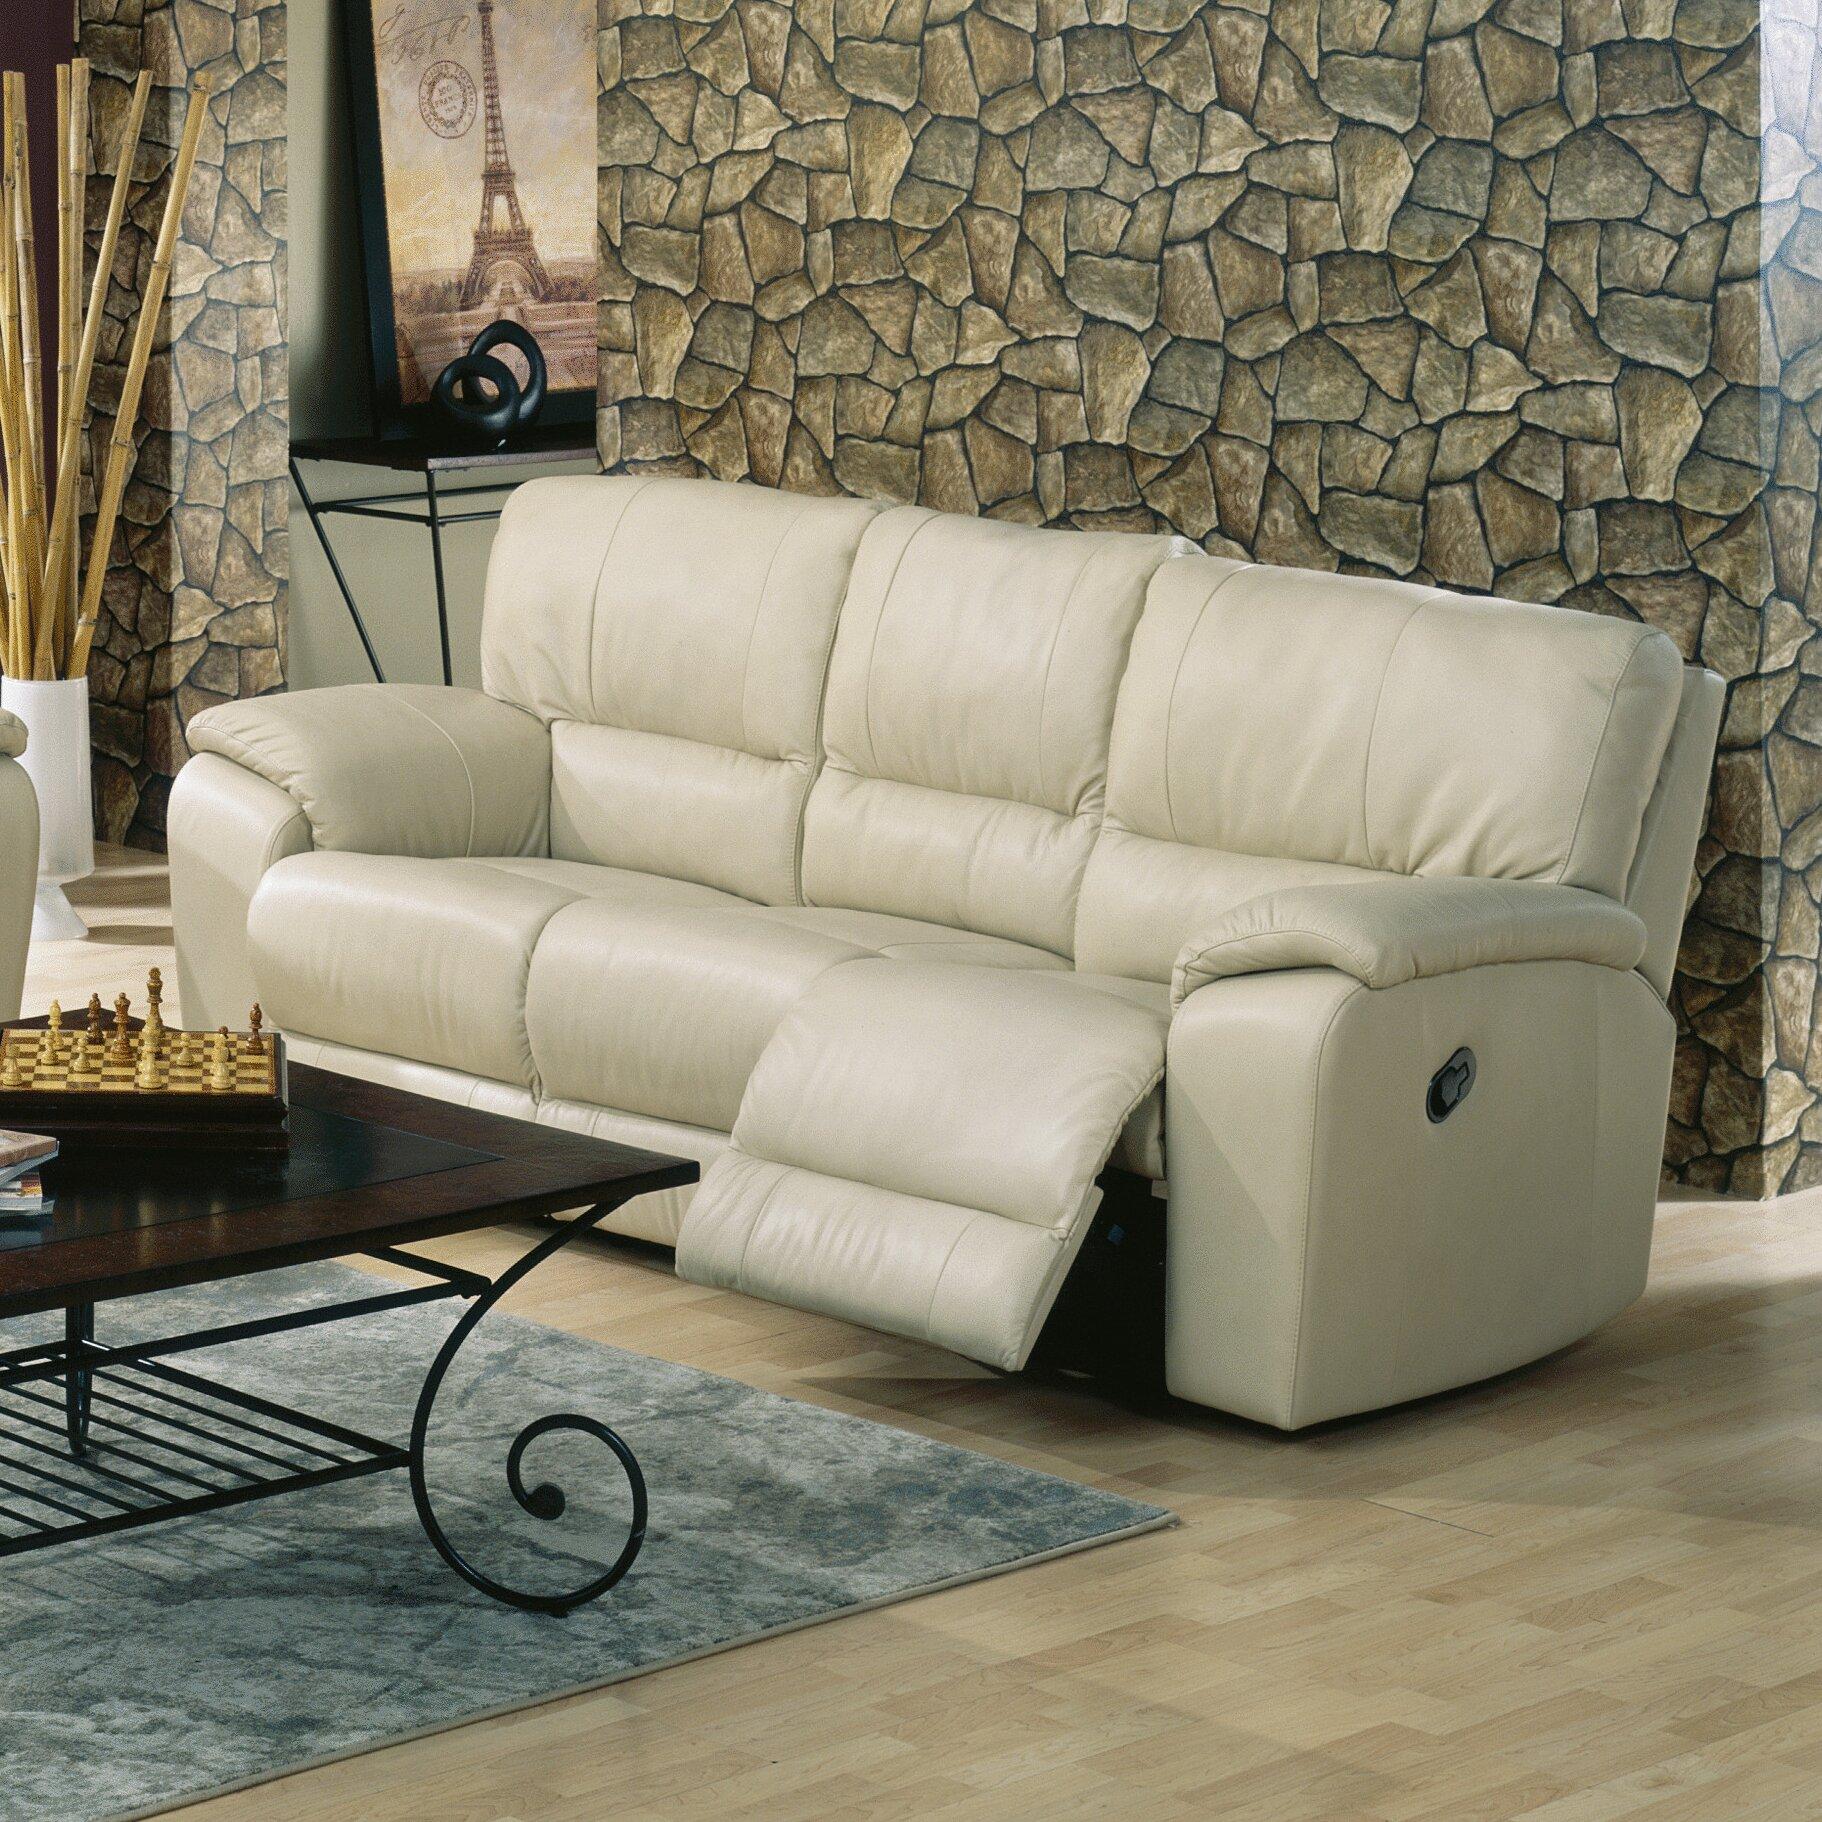 Palliser Leather Sofas: Palliser Furniture Shields Reclining Sofa & Reviews